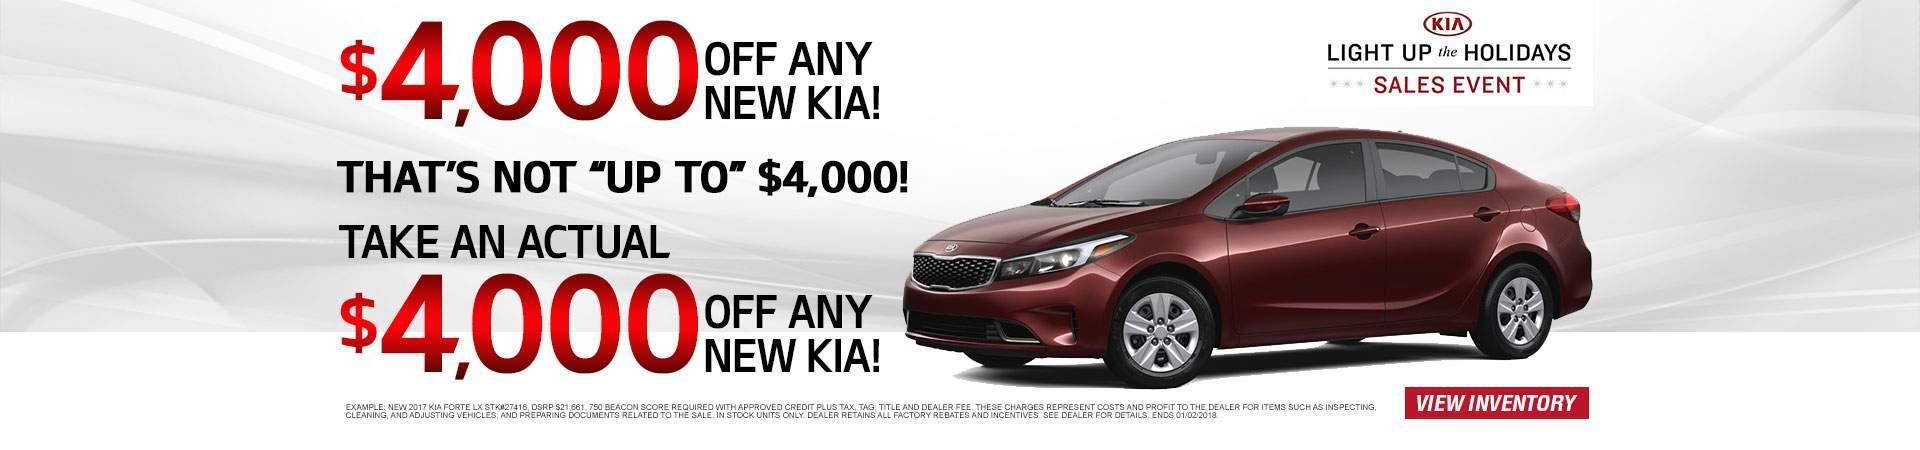 Kia Dealership Fort Pierce, FL | Used Cars Bev Smith Kia .